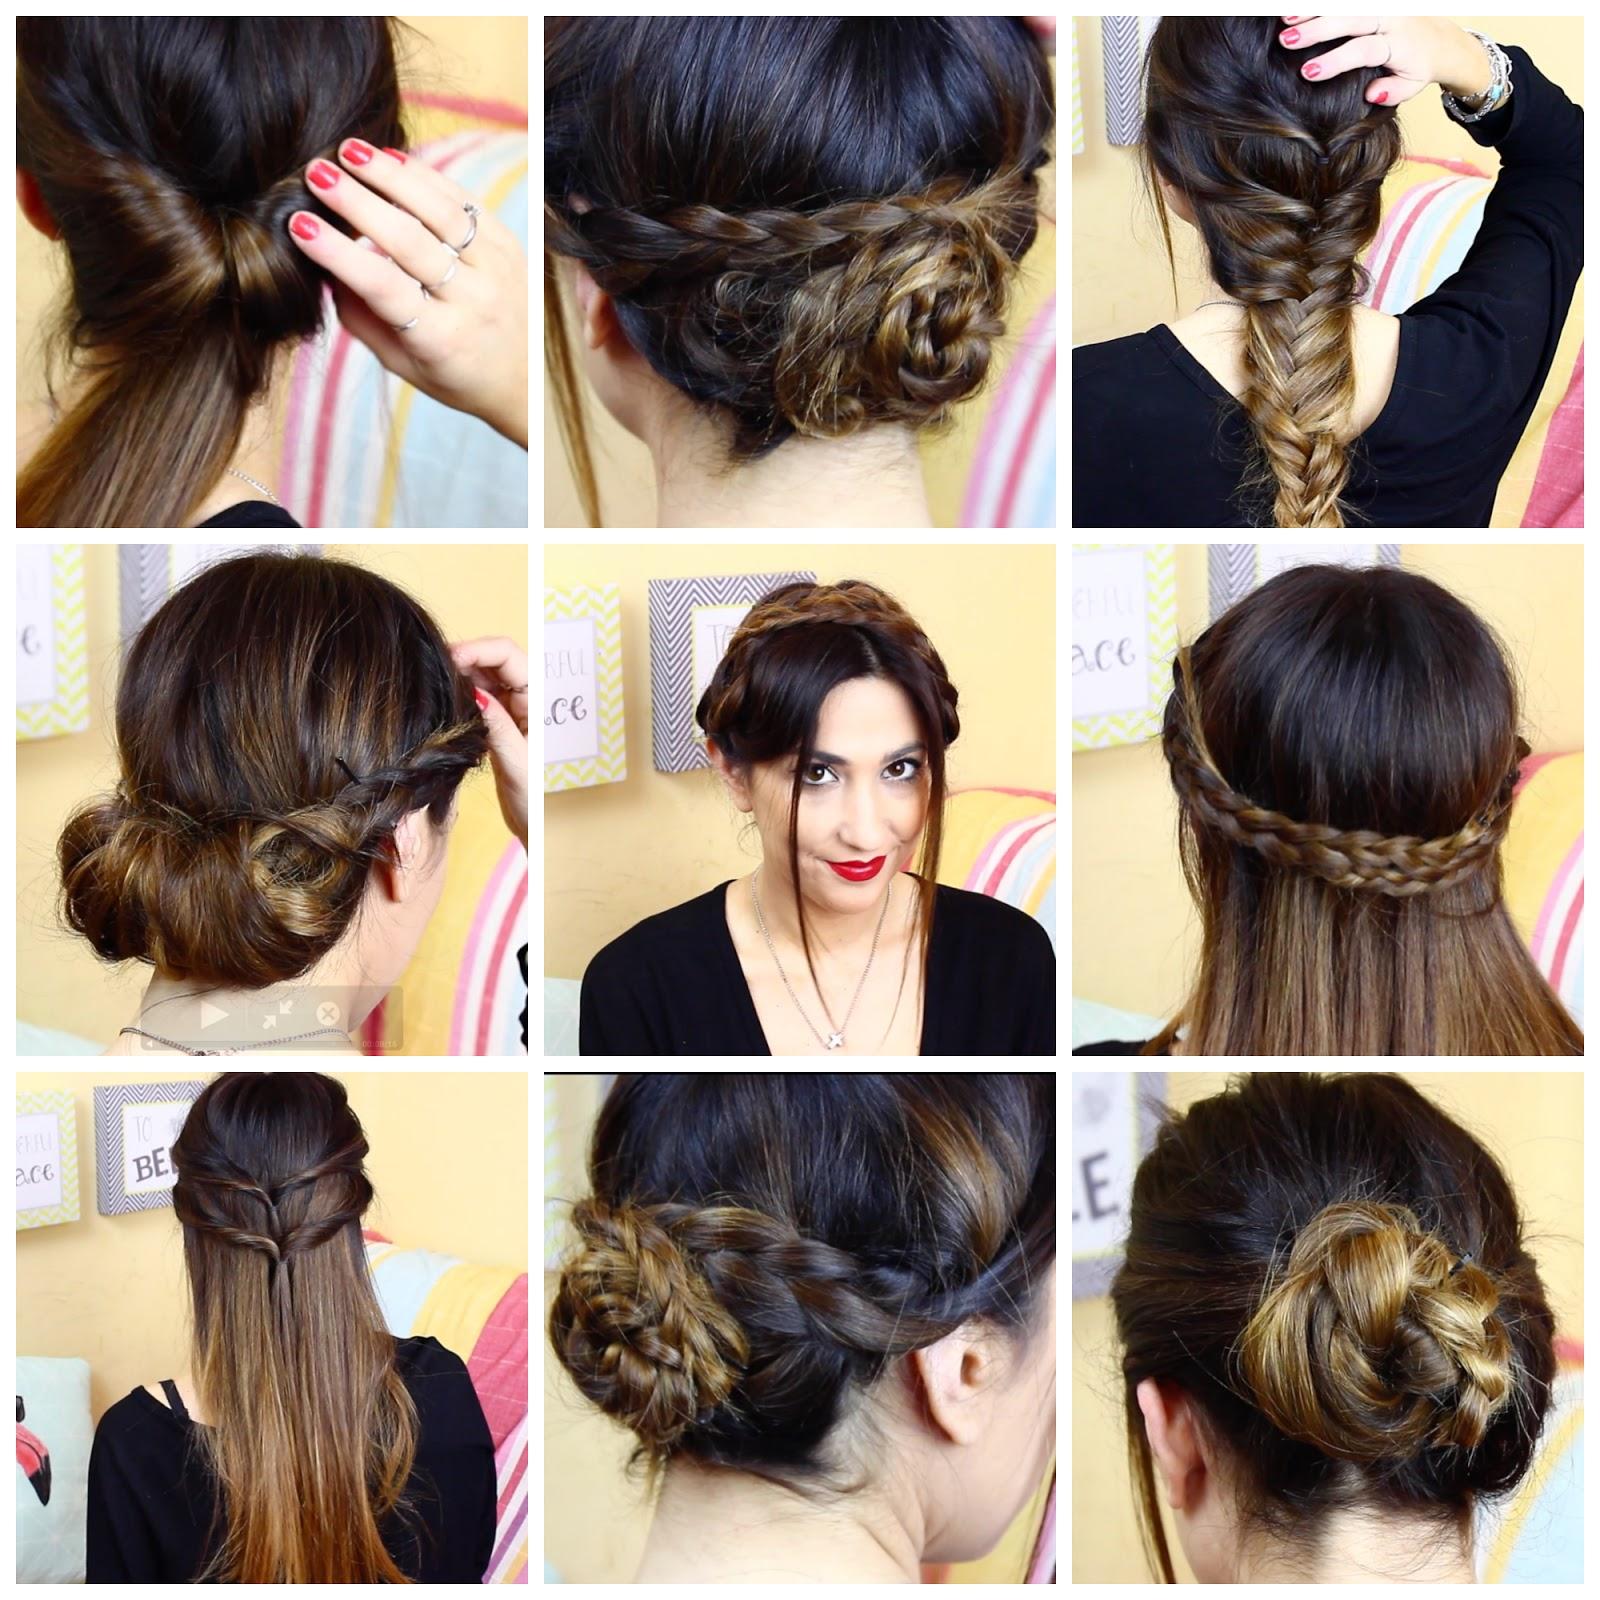 Videoblog new hair hairstyle 8 peinados f ciles y - Peinados faciles y rapidos paso a paso ...